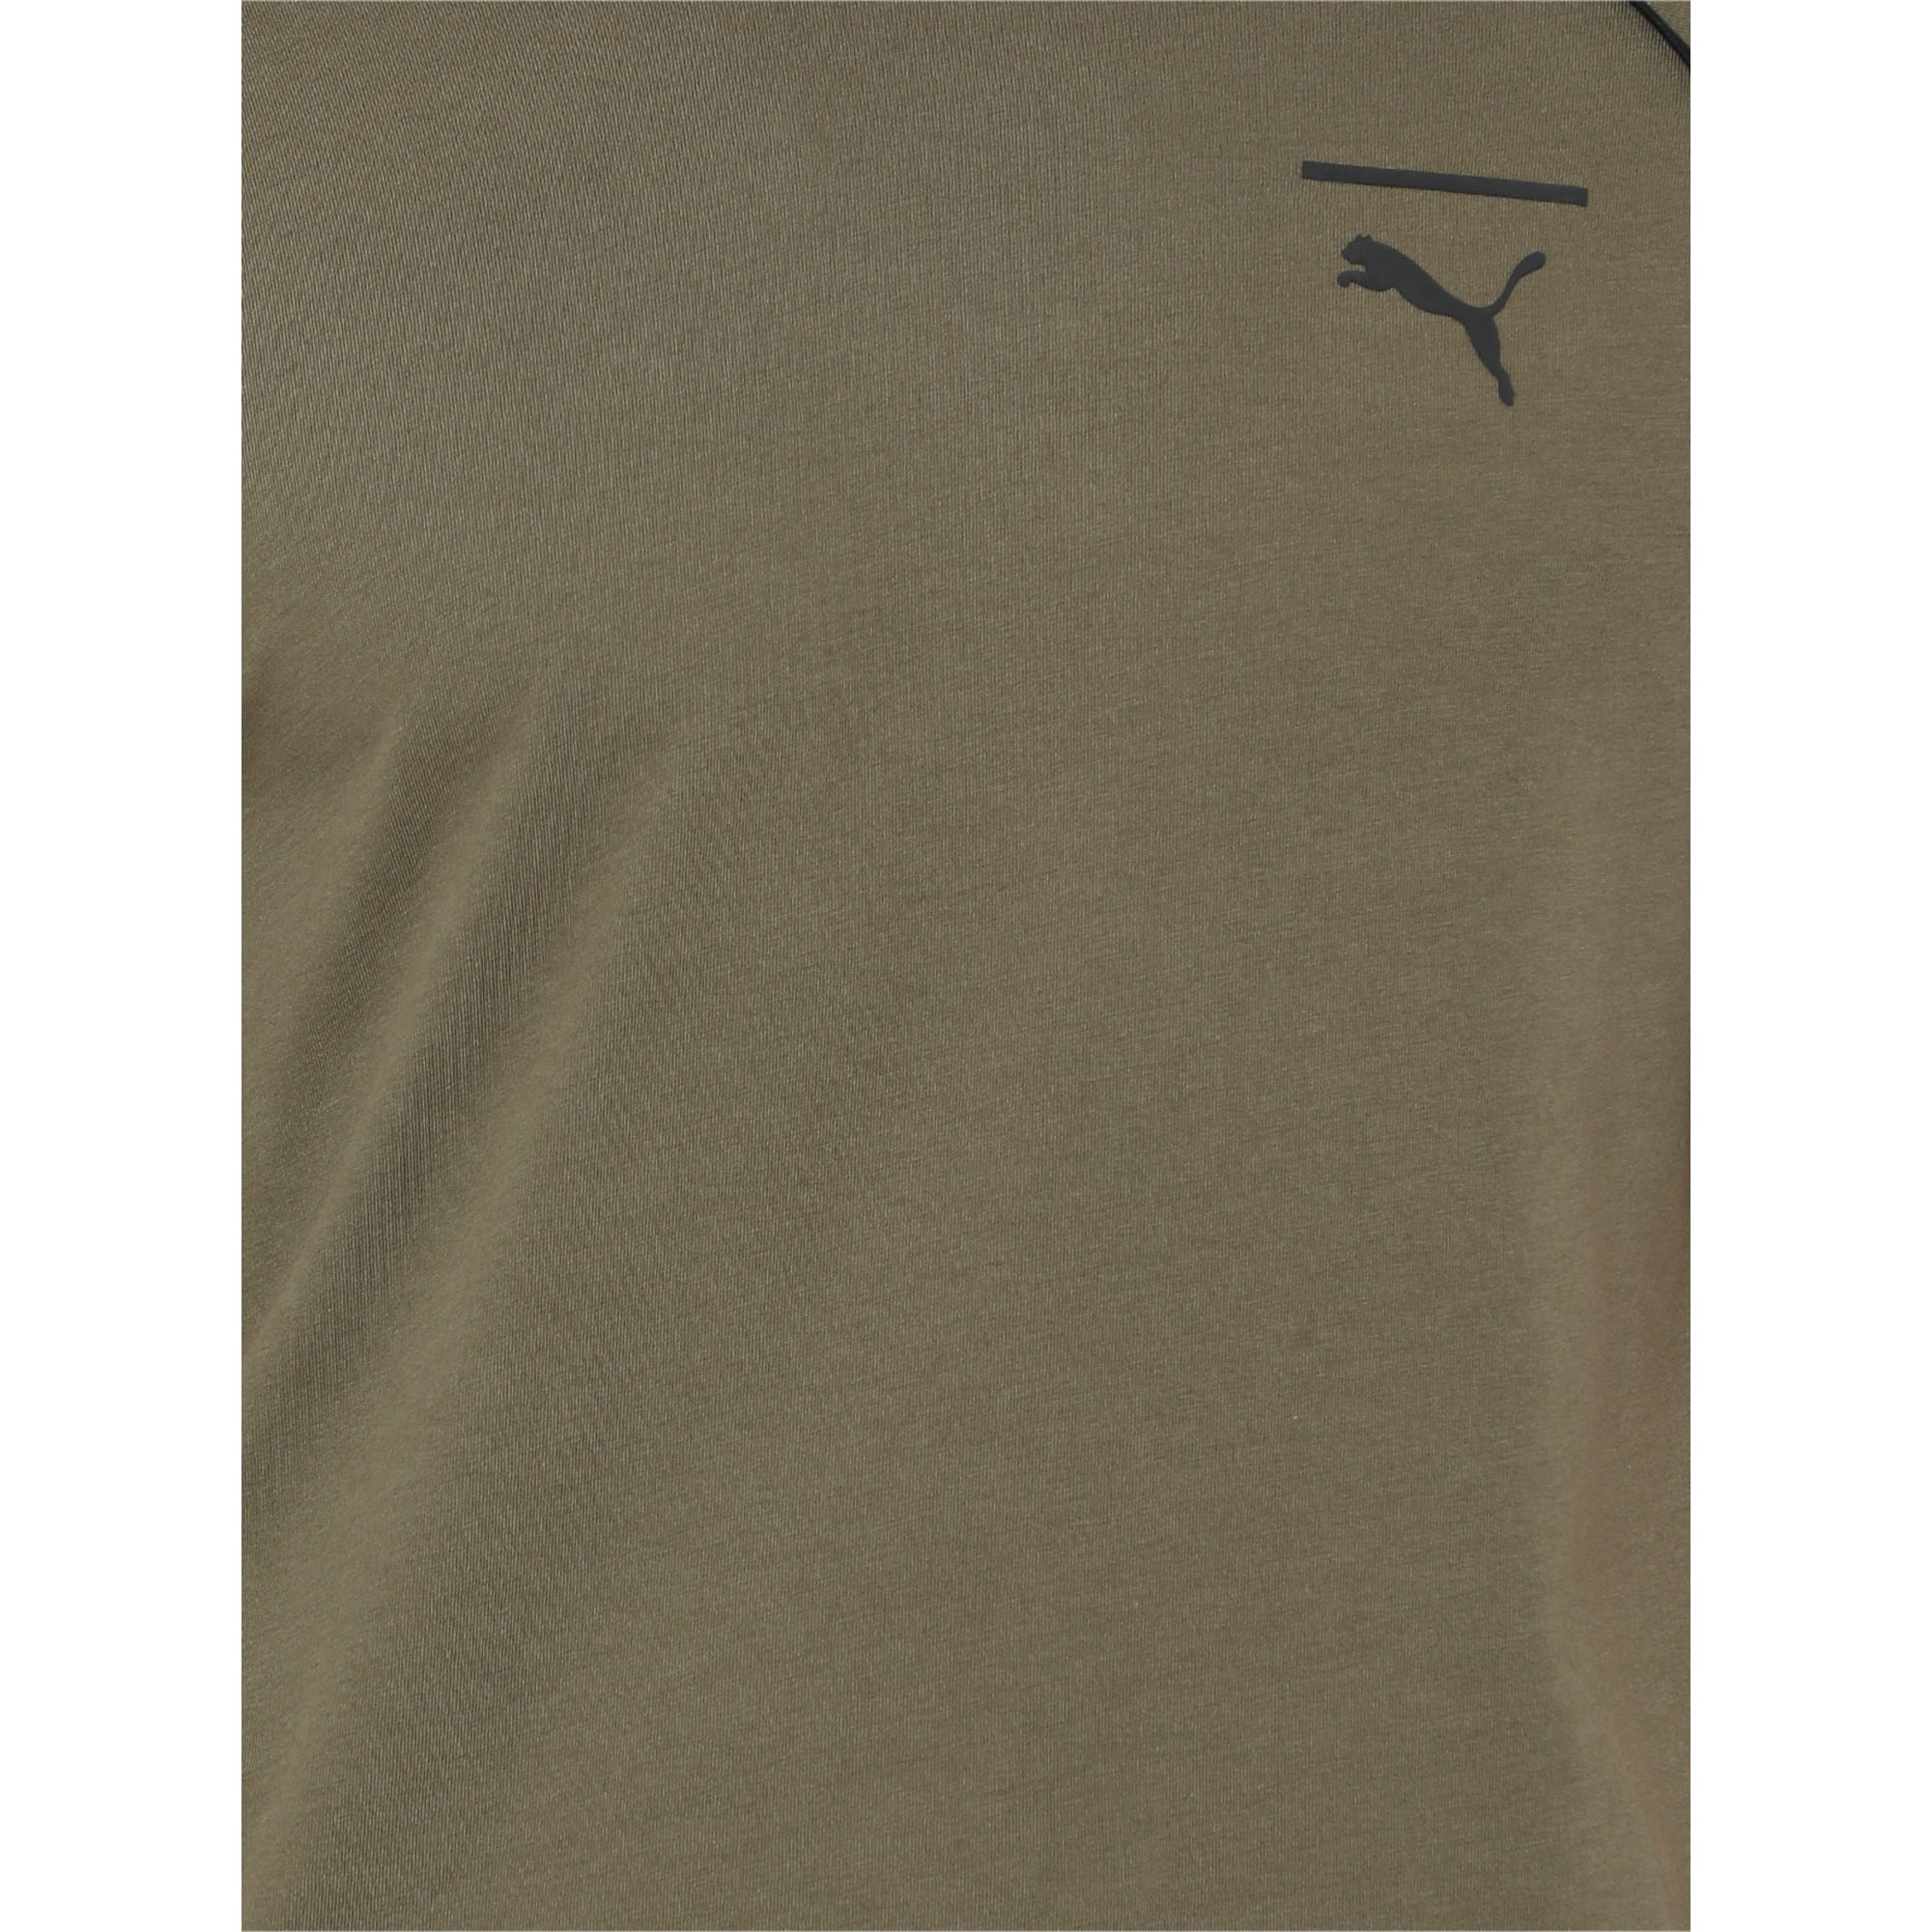 Thumbnail 3 of Evolution Men's Core T-Shirt, Olive Night, medium-IND